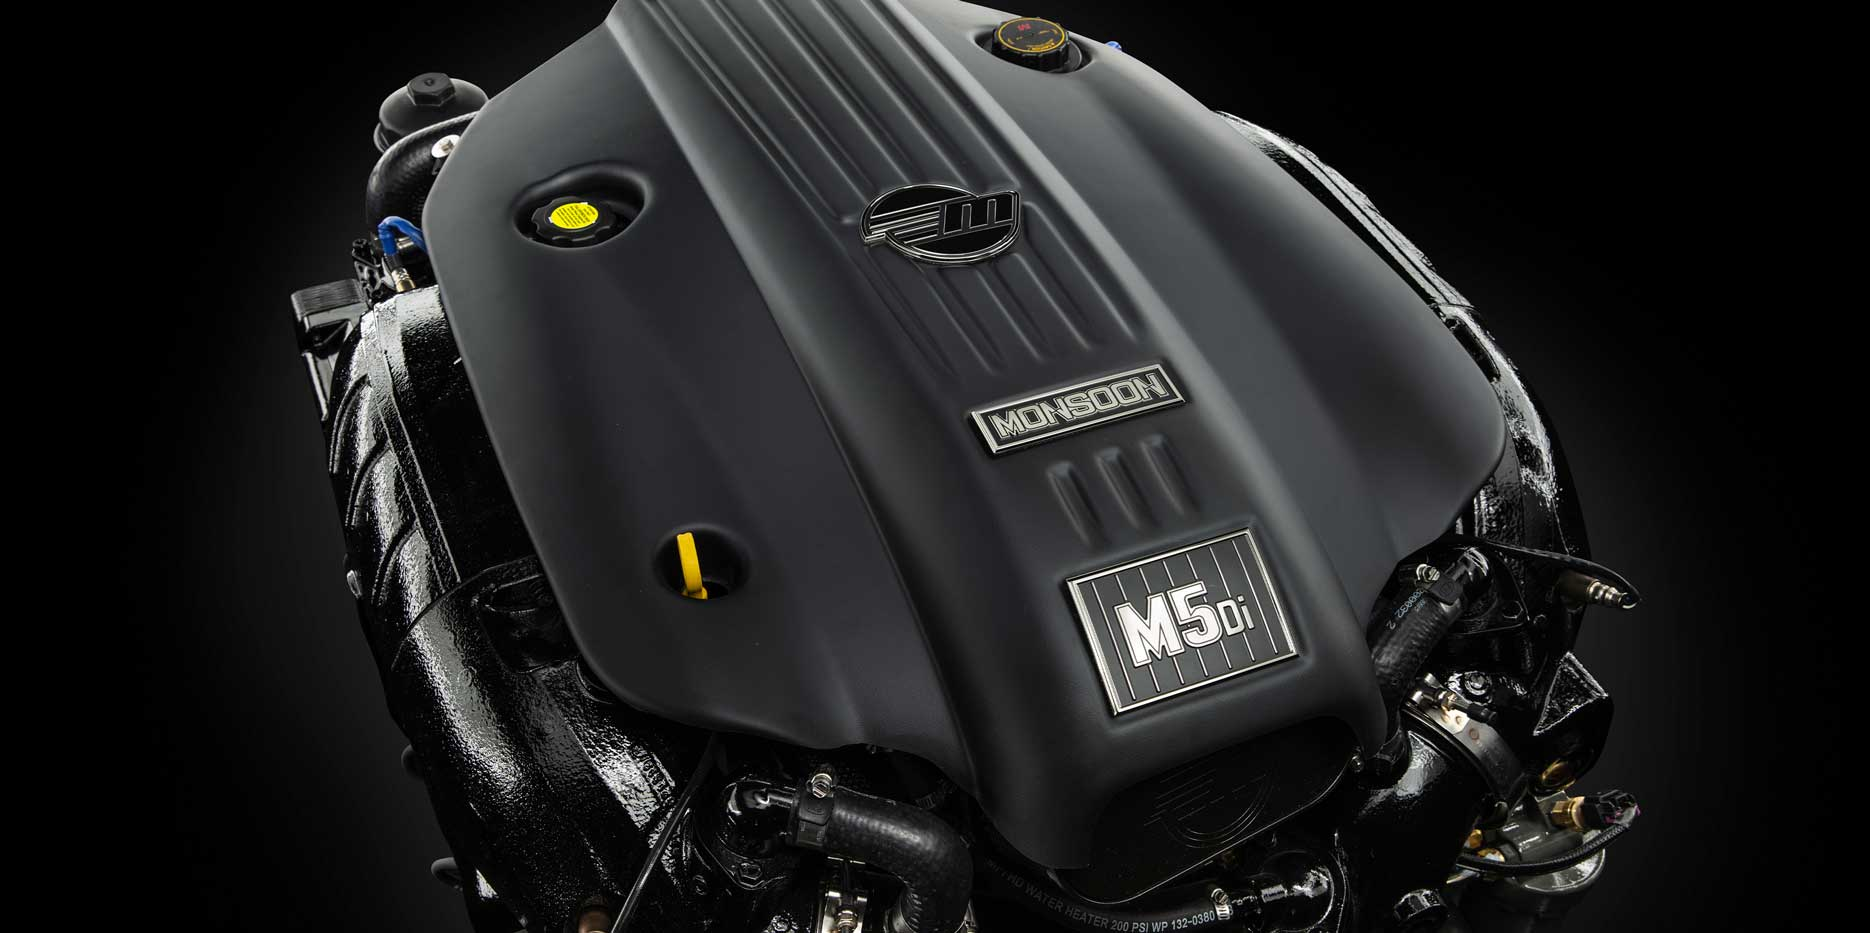 Malibu Monsoon Engine